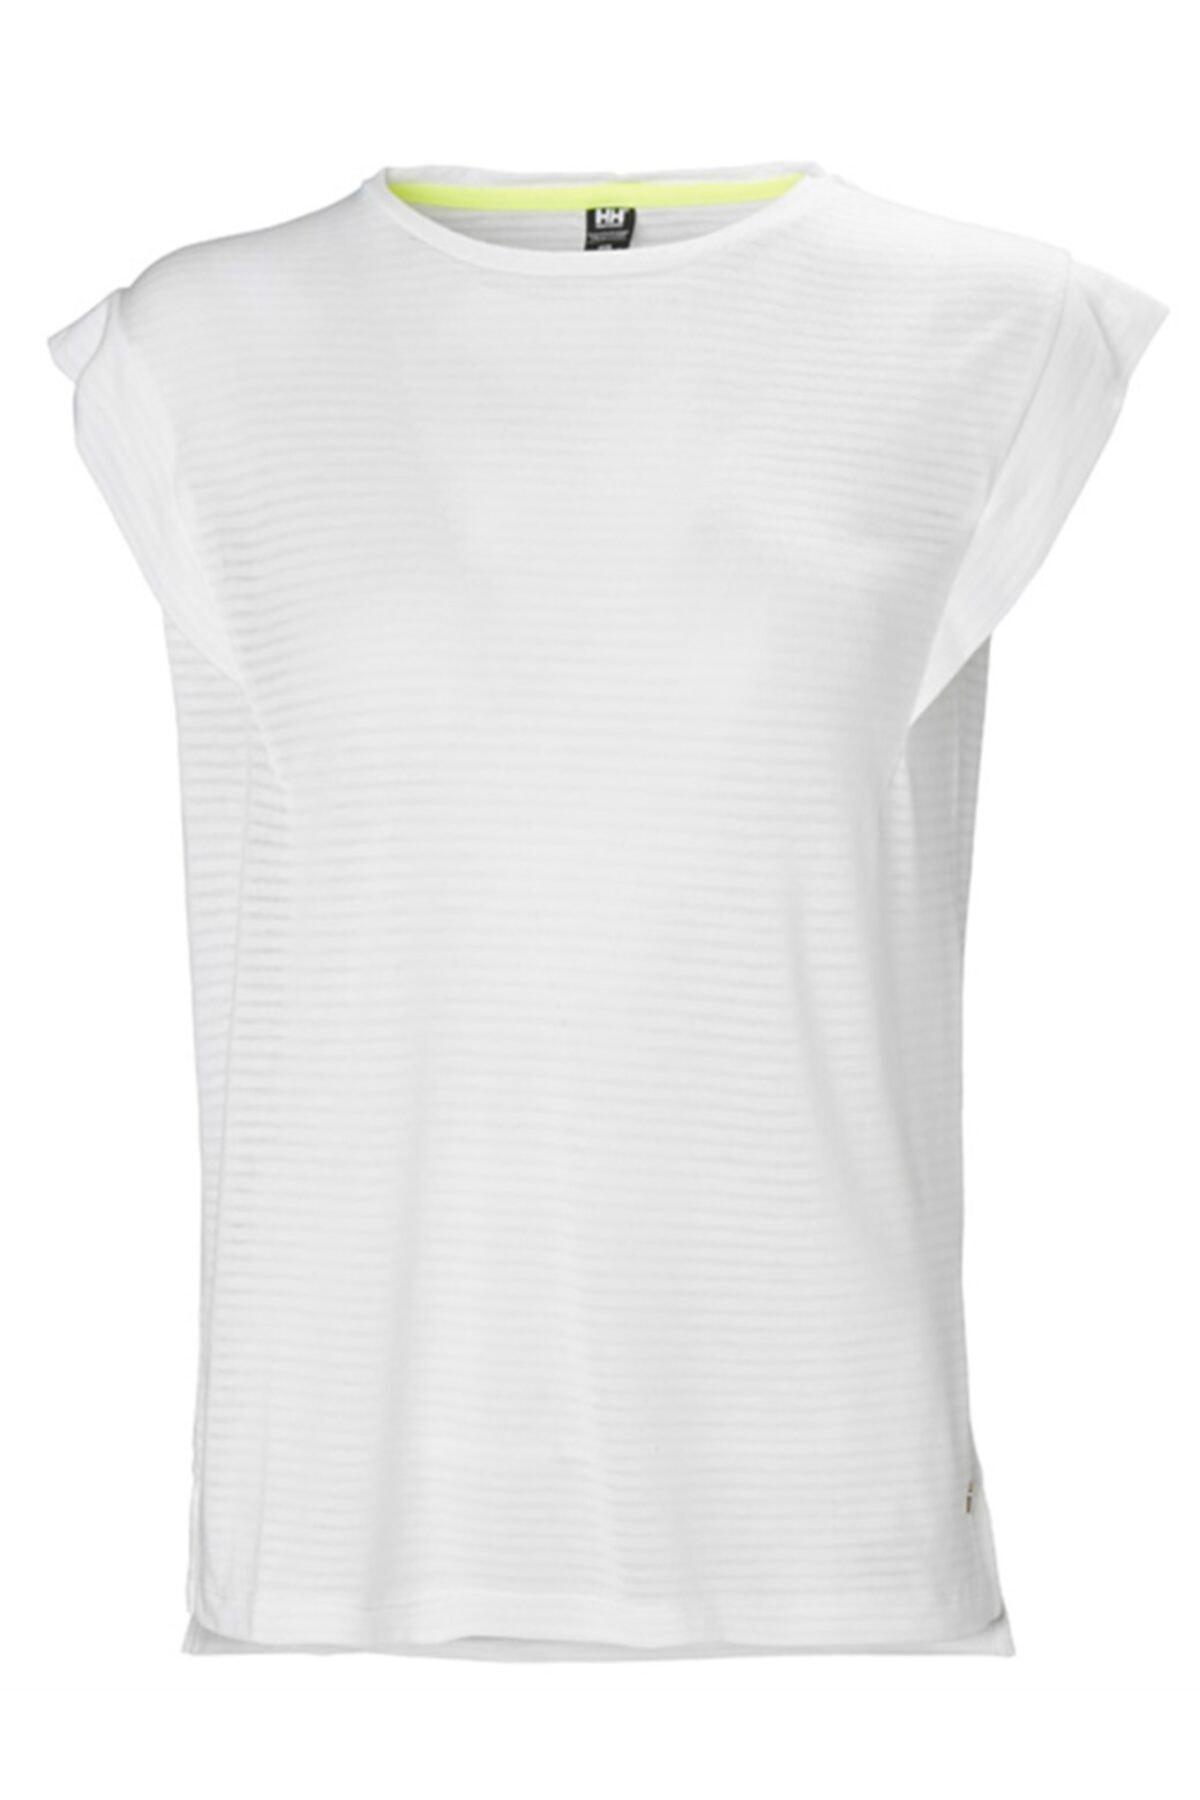 Helly Hansen W Siren Spring Kadın T-shirt Beyaz 1